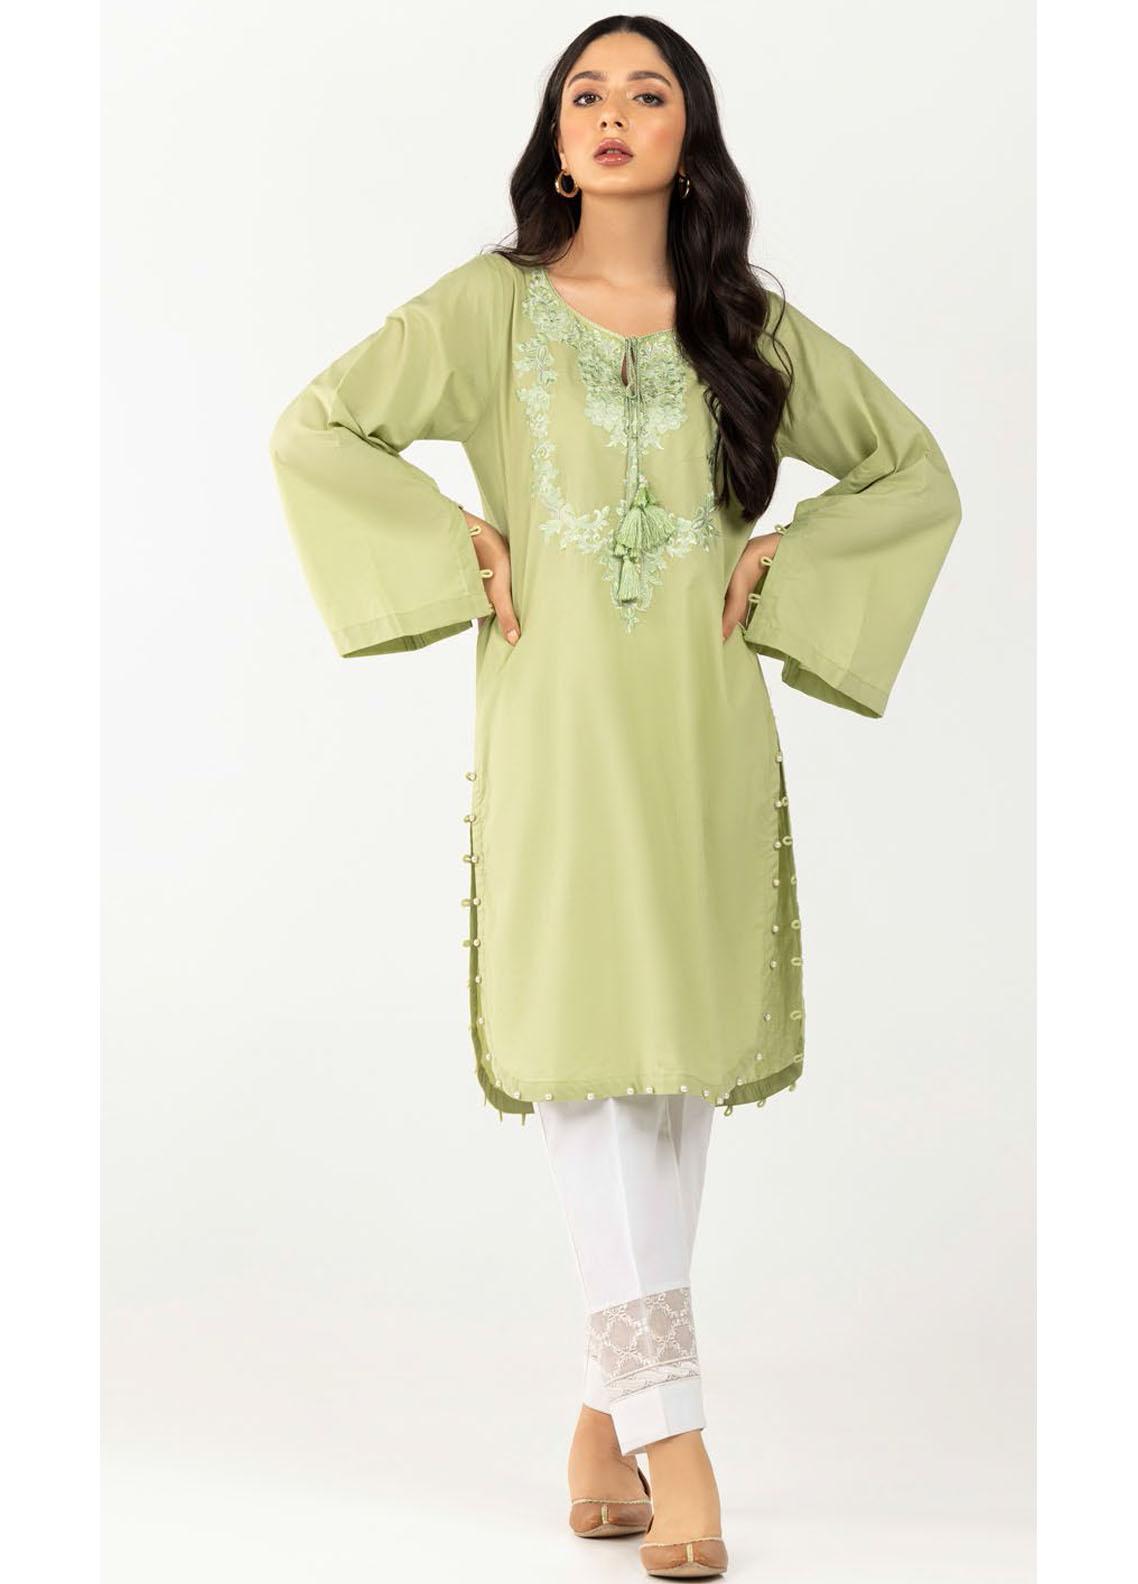 Gul Ahmed Luxury Pret Printed Cambric Kurties GA21K WGK-CMS-DE-706